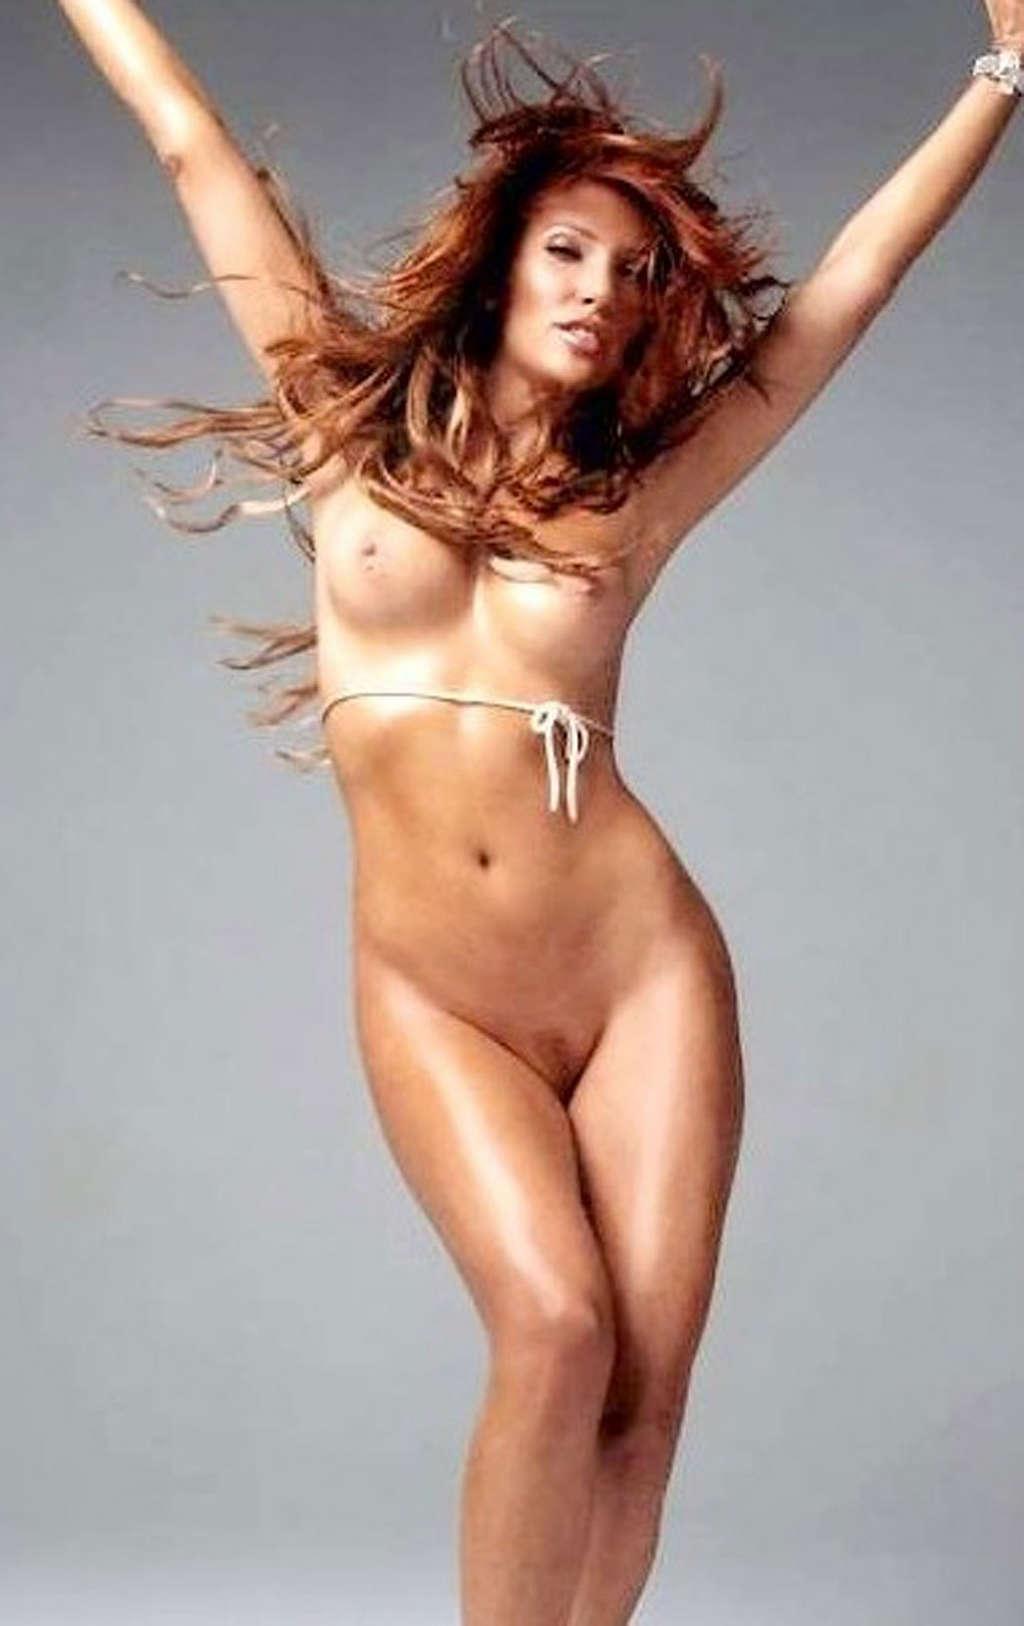 Hot girl nude